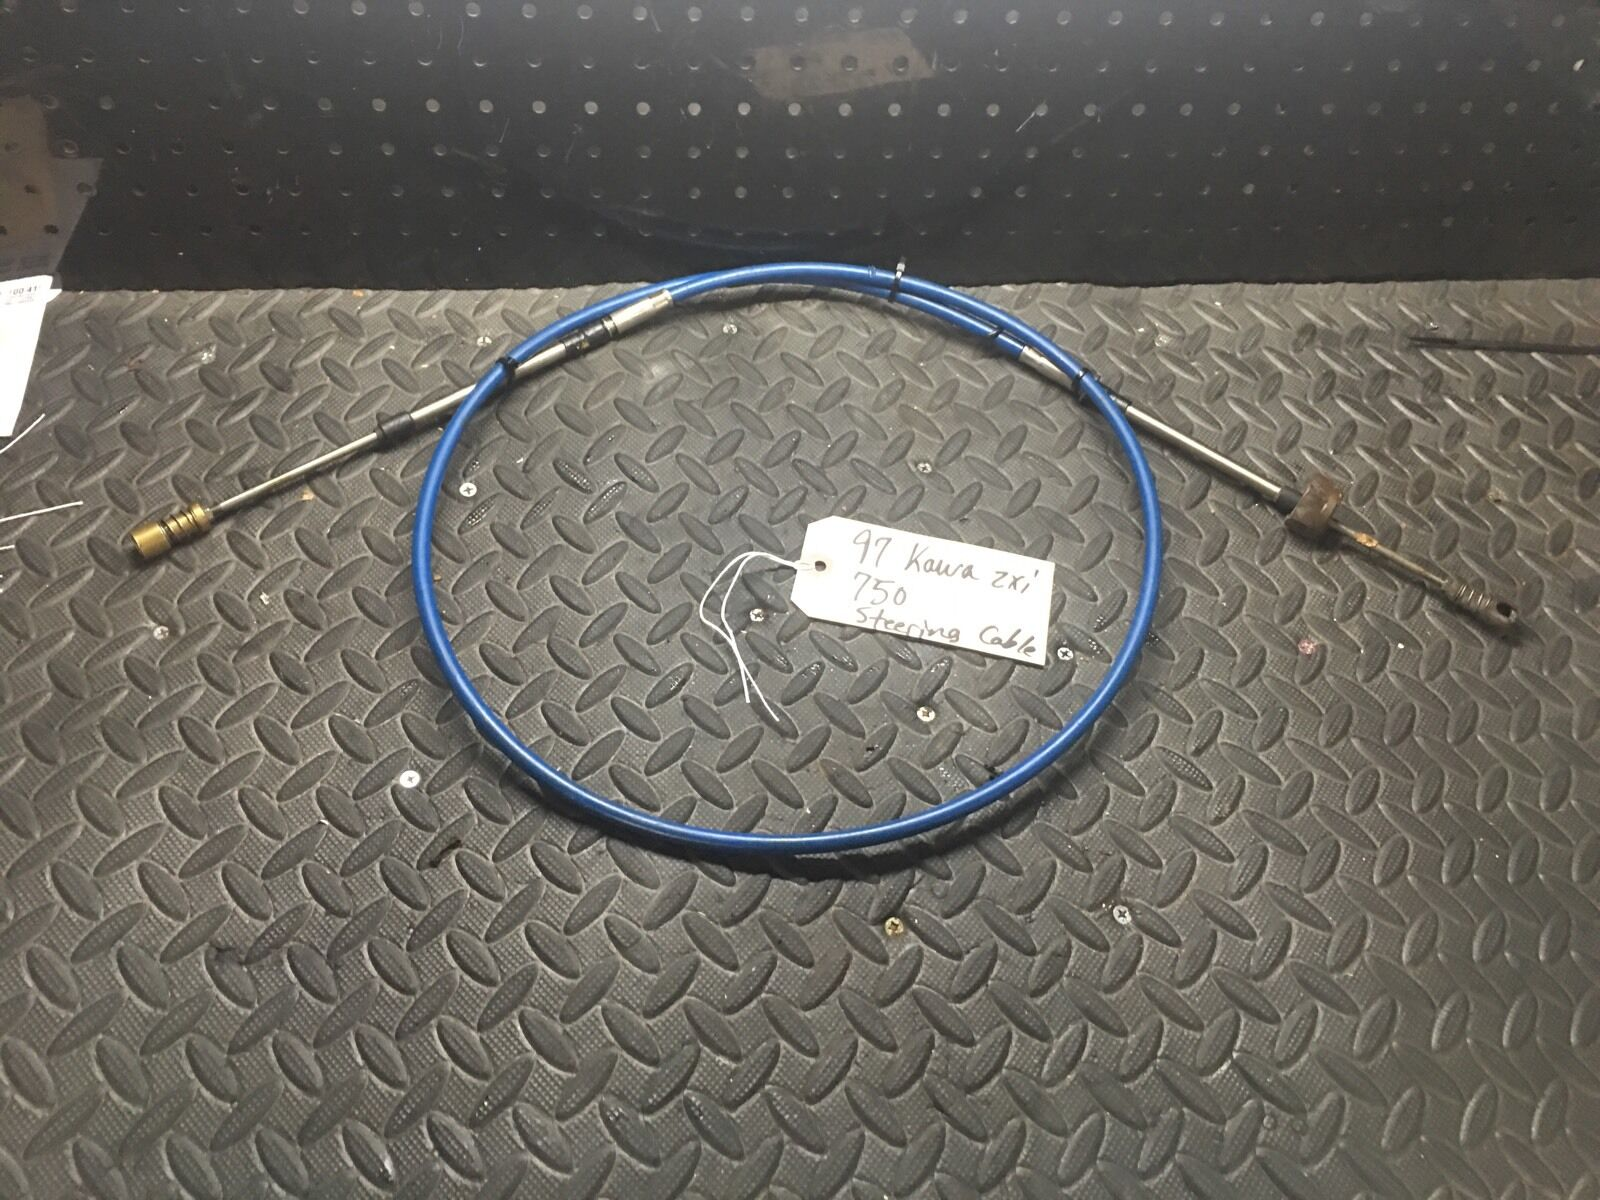 Steering Cable For 1995 Kawasaki JH750 750ZXi Personal Watercraft WSM 002-042-02